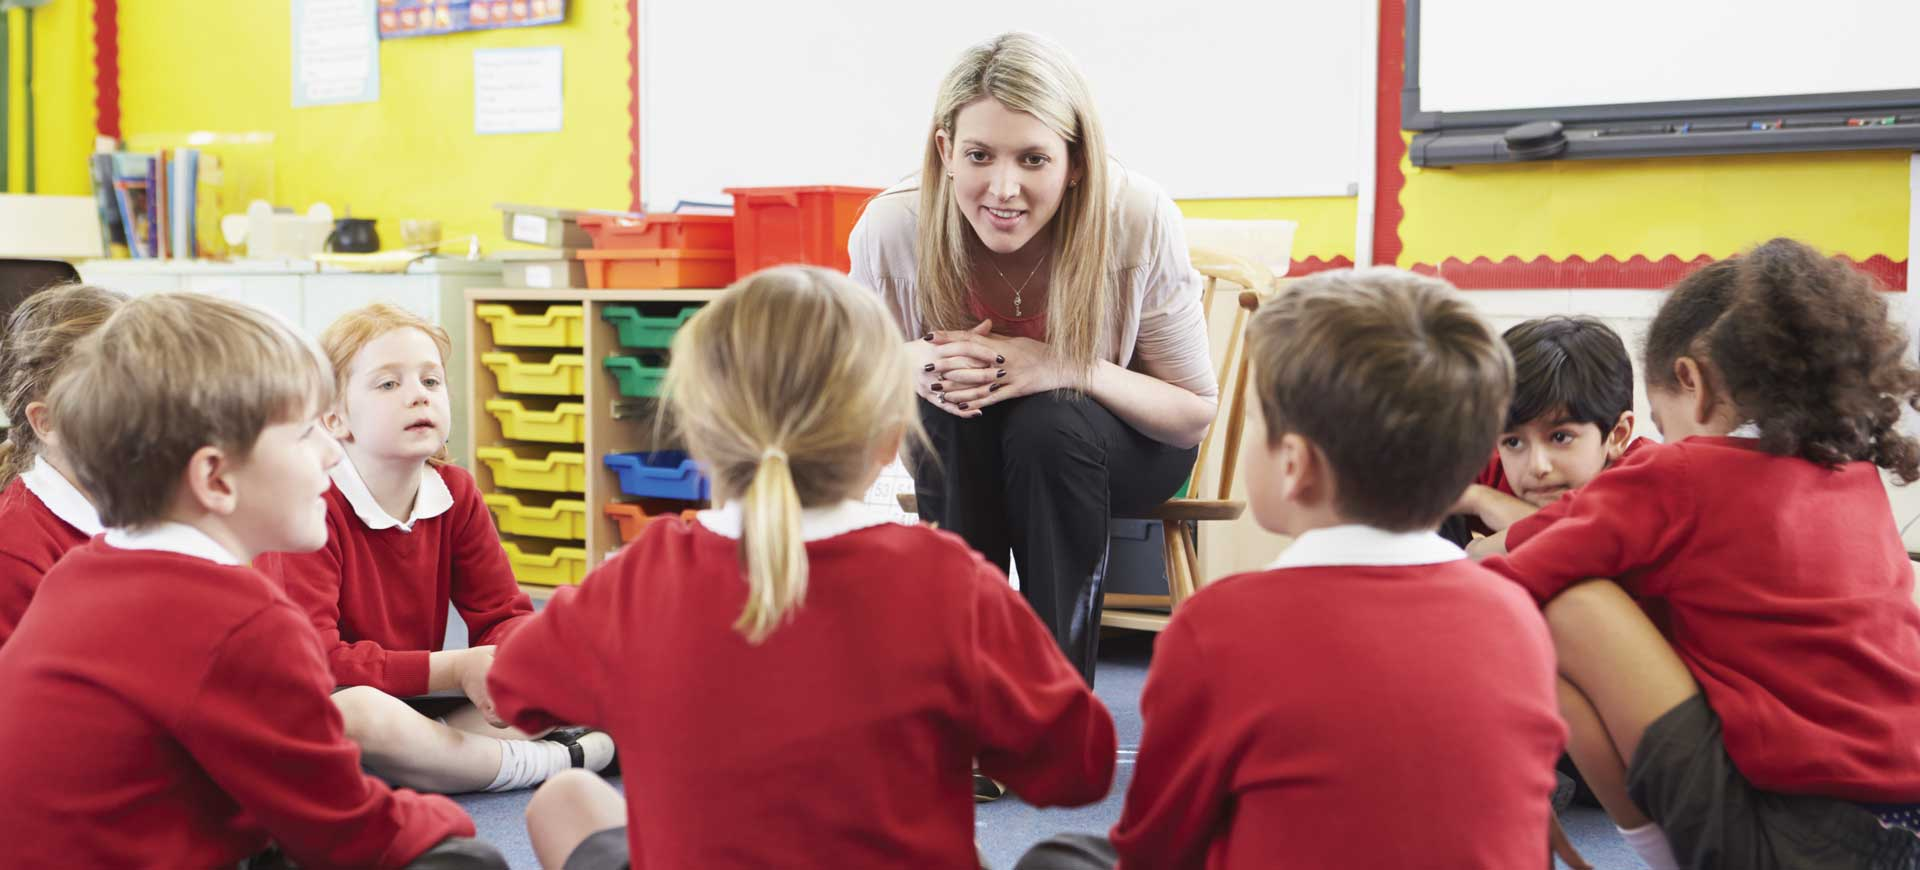 mobilie classrooms